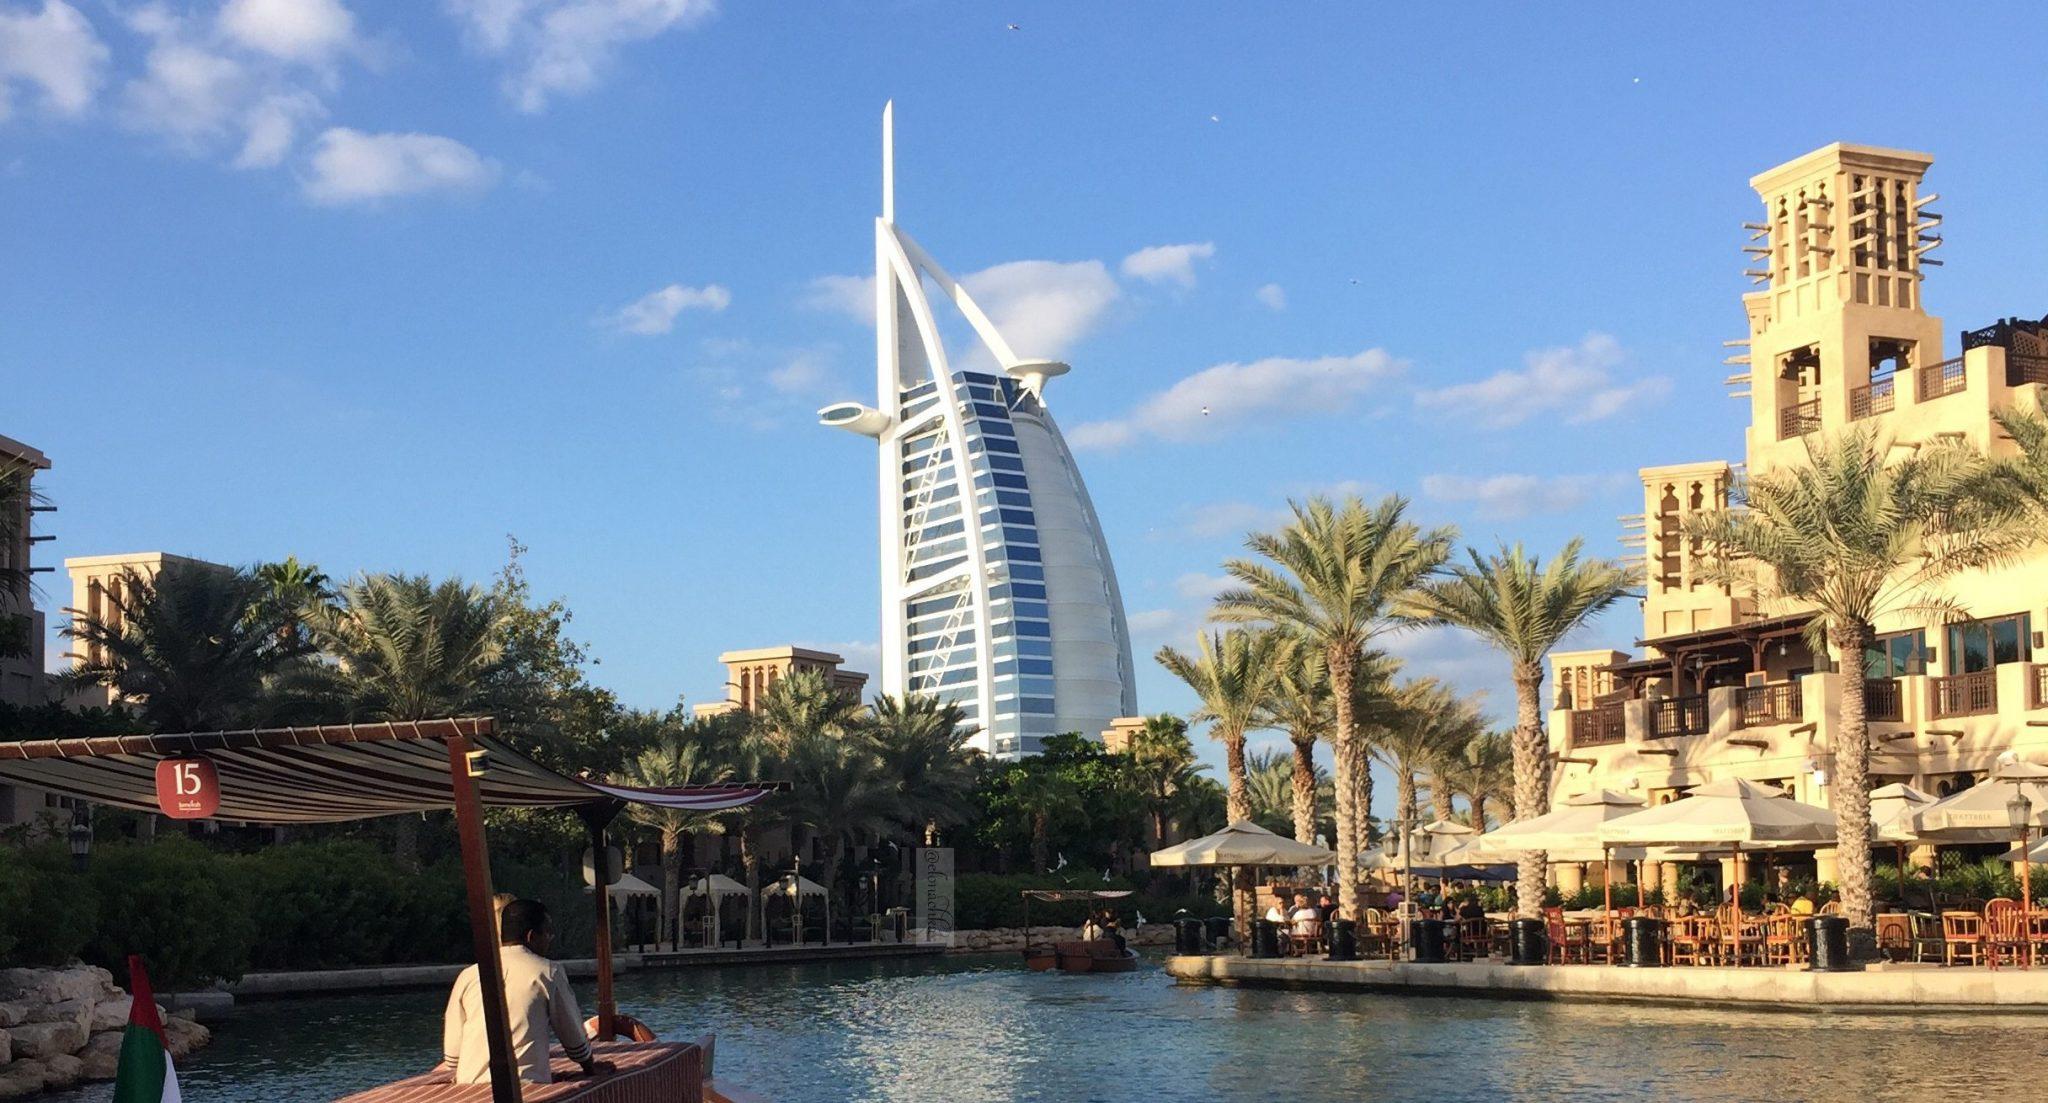 The Emirates Part III